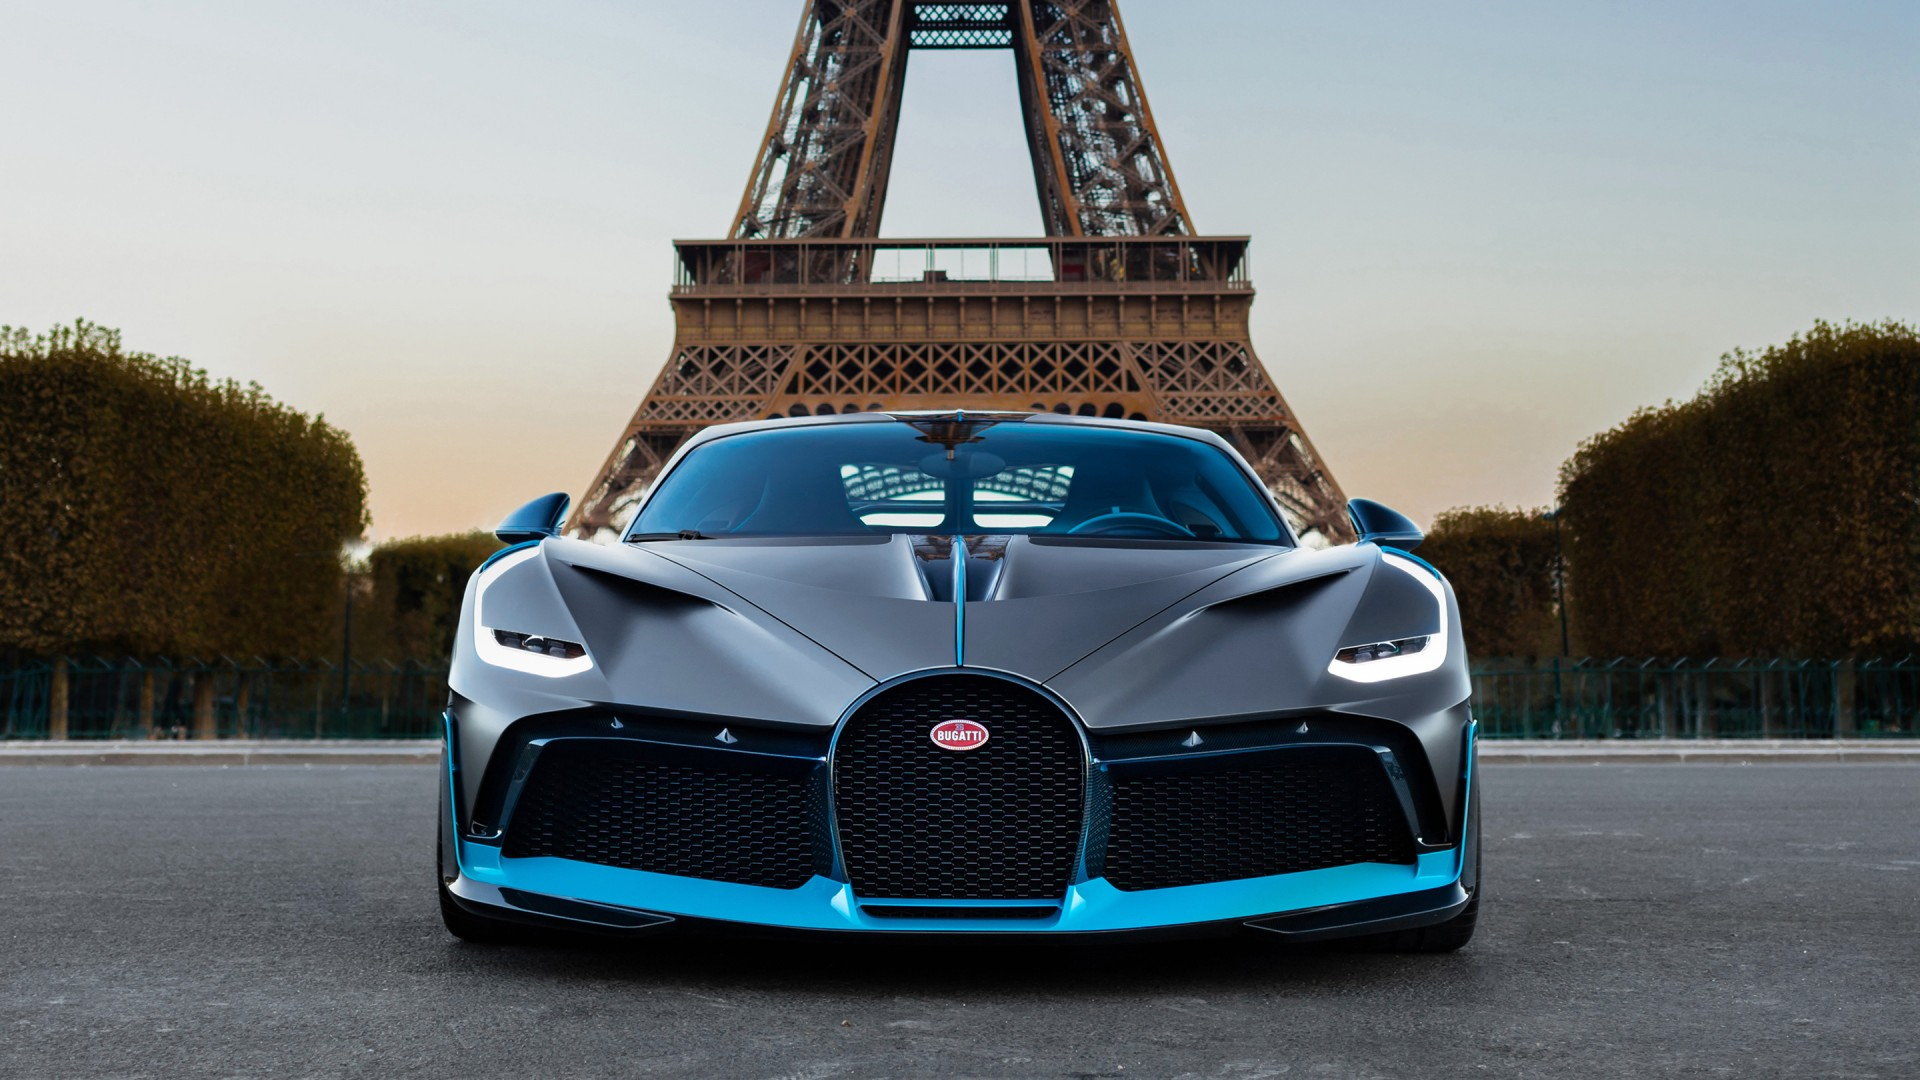 Bugatti Divo in Paris 2 Wallpaper   HD Car Wallpapers   ID ...